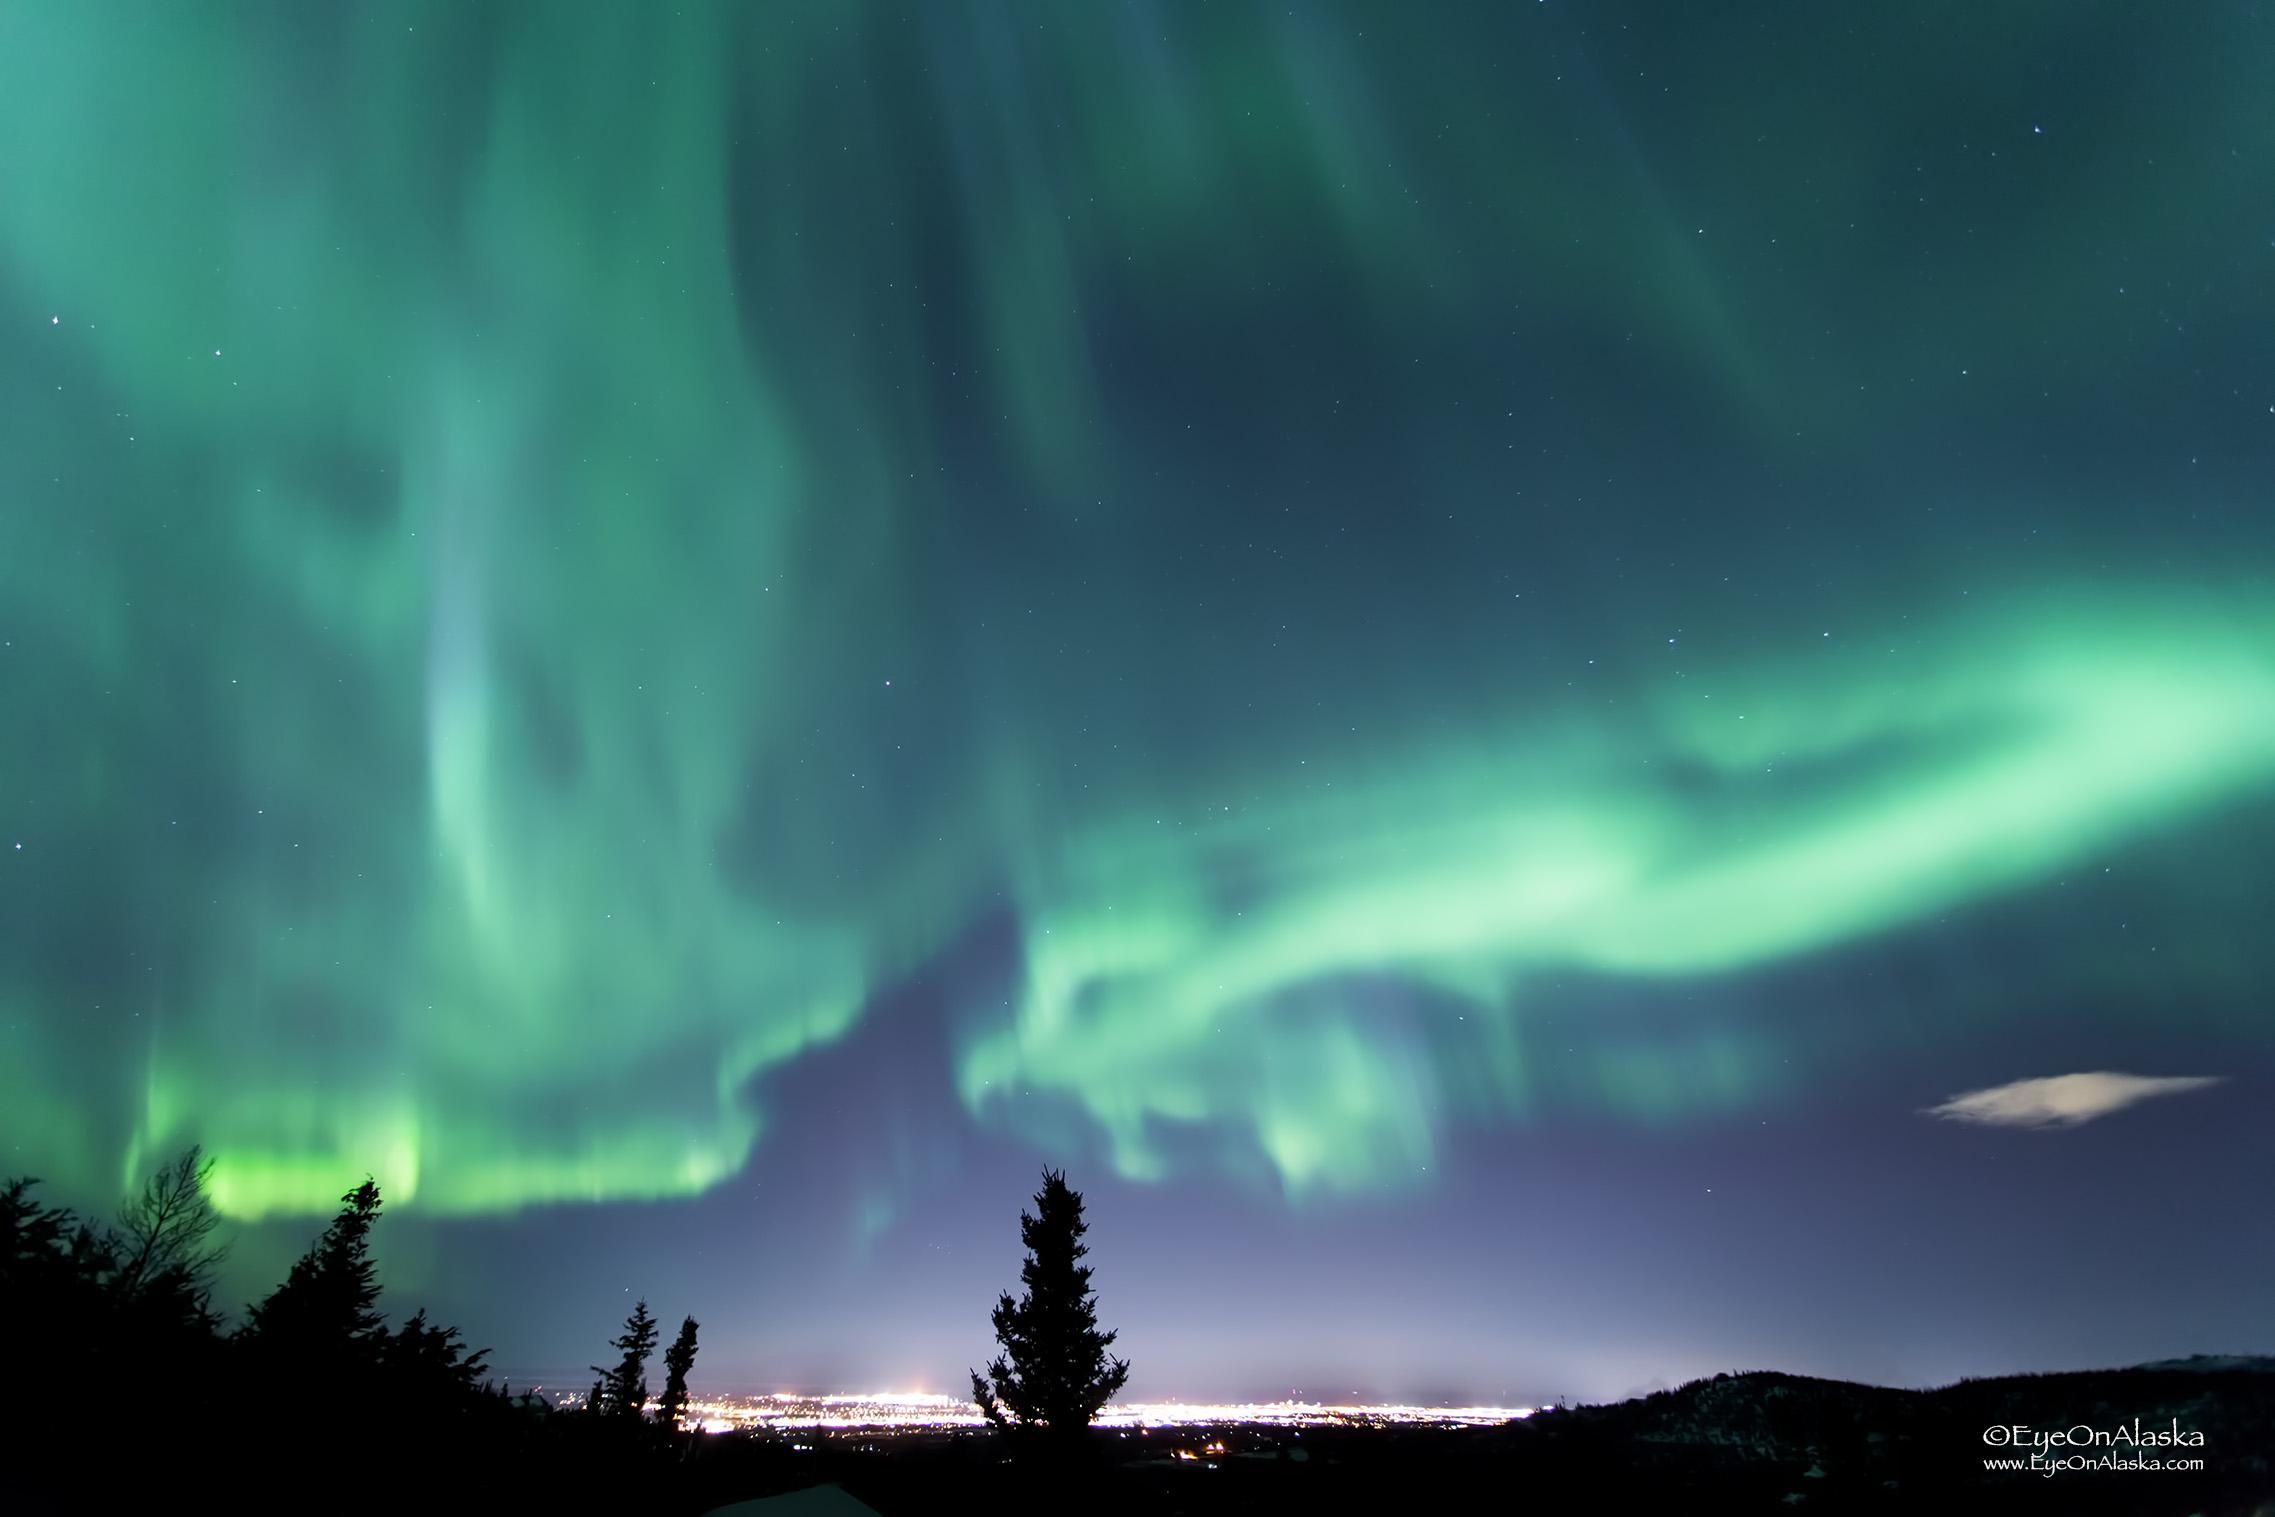 A blanket of aurora over Anchorage.